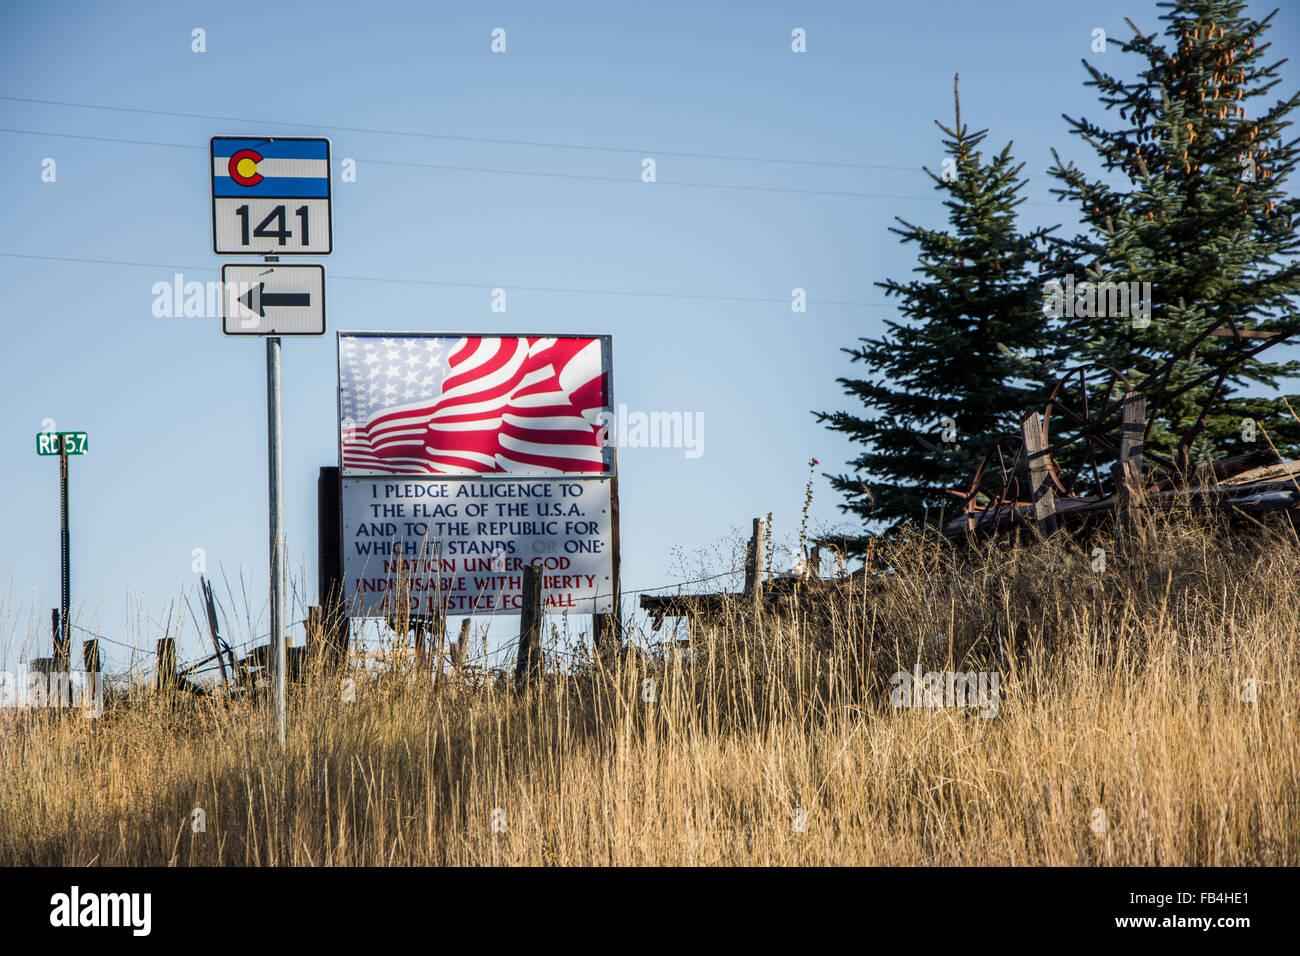 Roadside Pledge of Allegiance/ patriotism in Southwestern, Colorado, USA - Stock Image